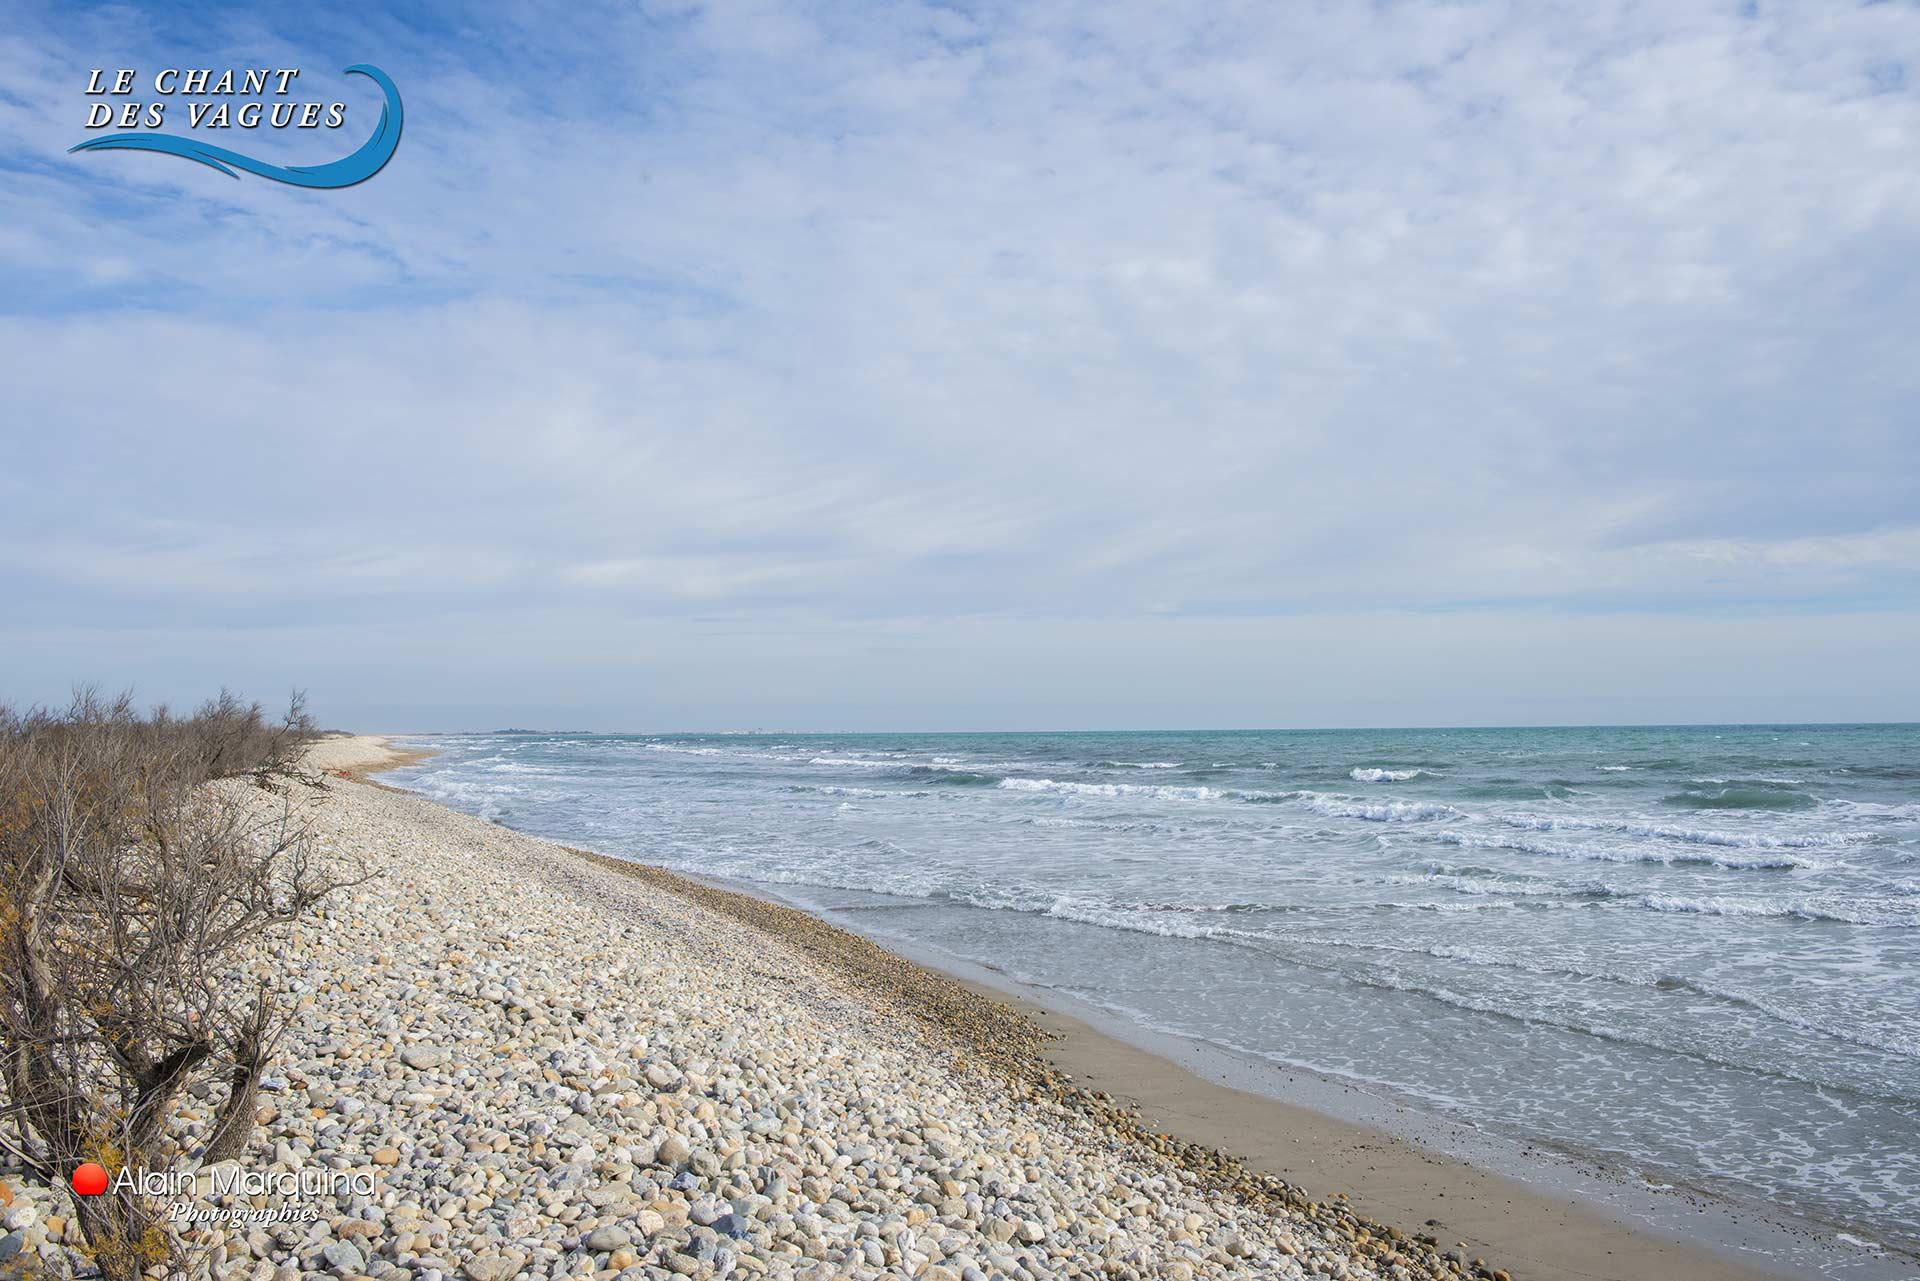 plage-sauvage-aresquiers-frontignan-plage